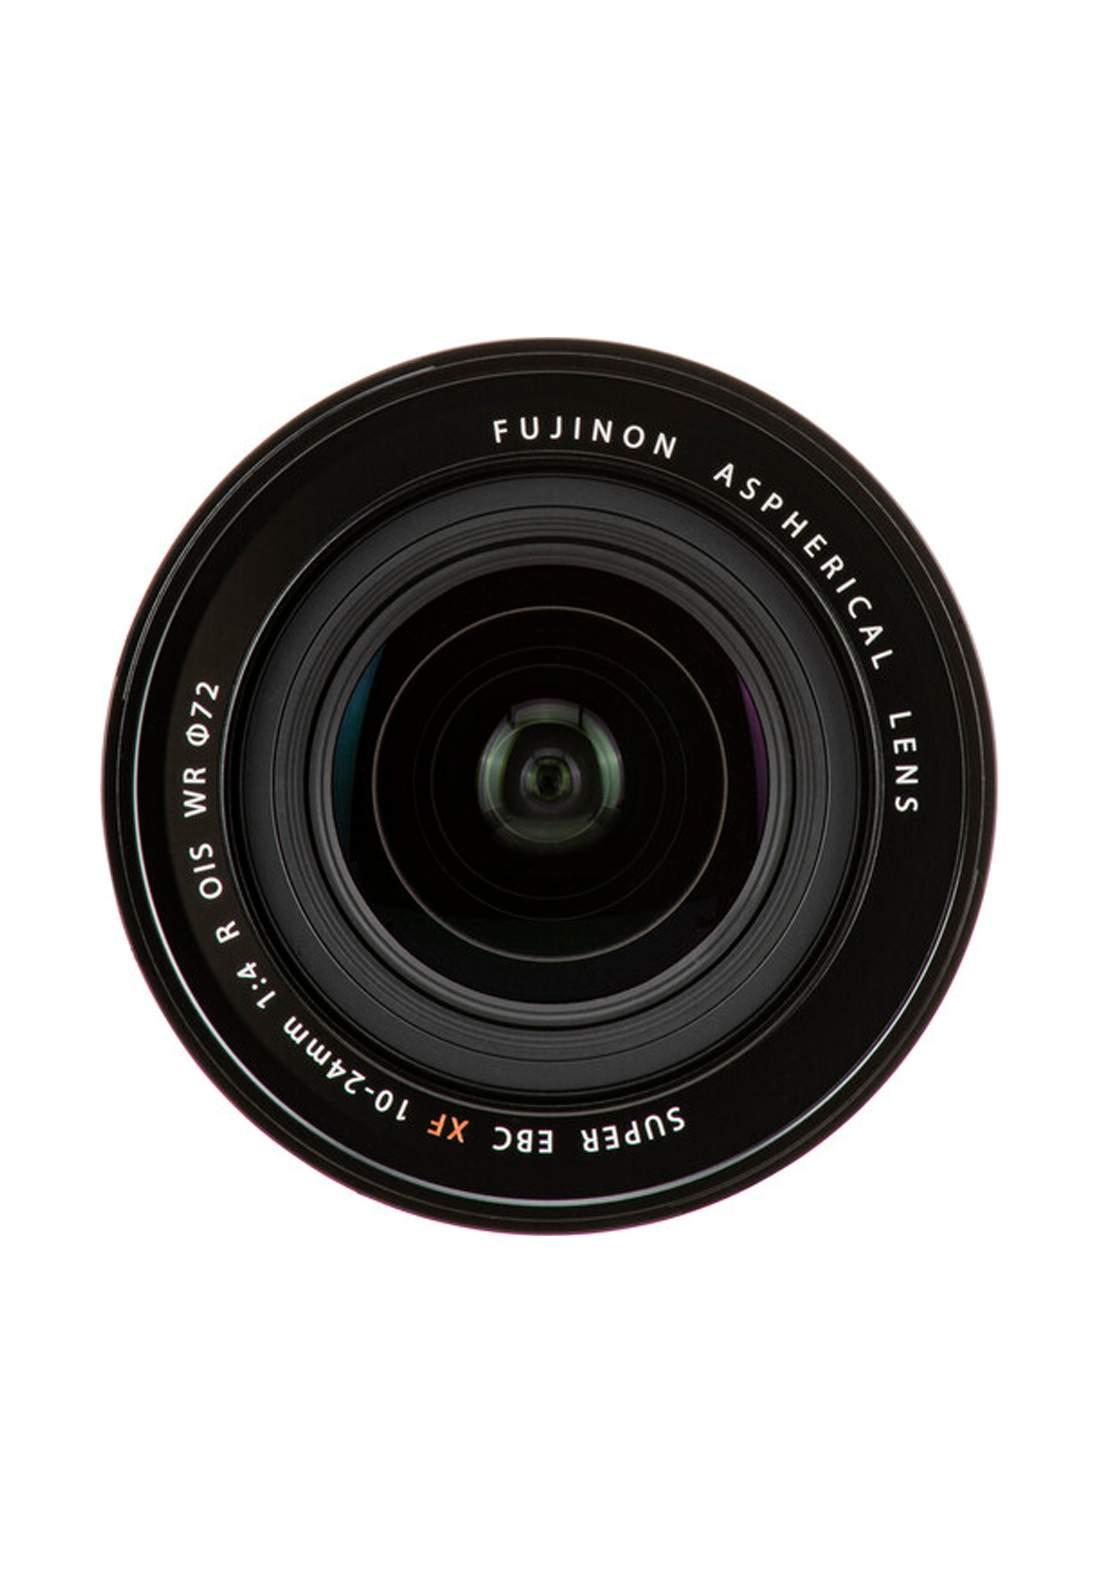 Fujifilm XF 10-24mm F4 R OIS WR Lens  - Black عدسة كاميرا